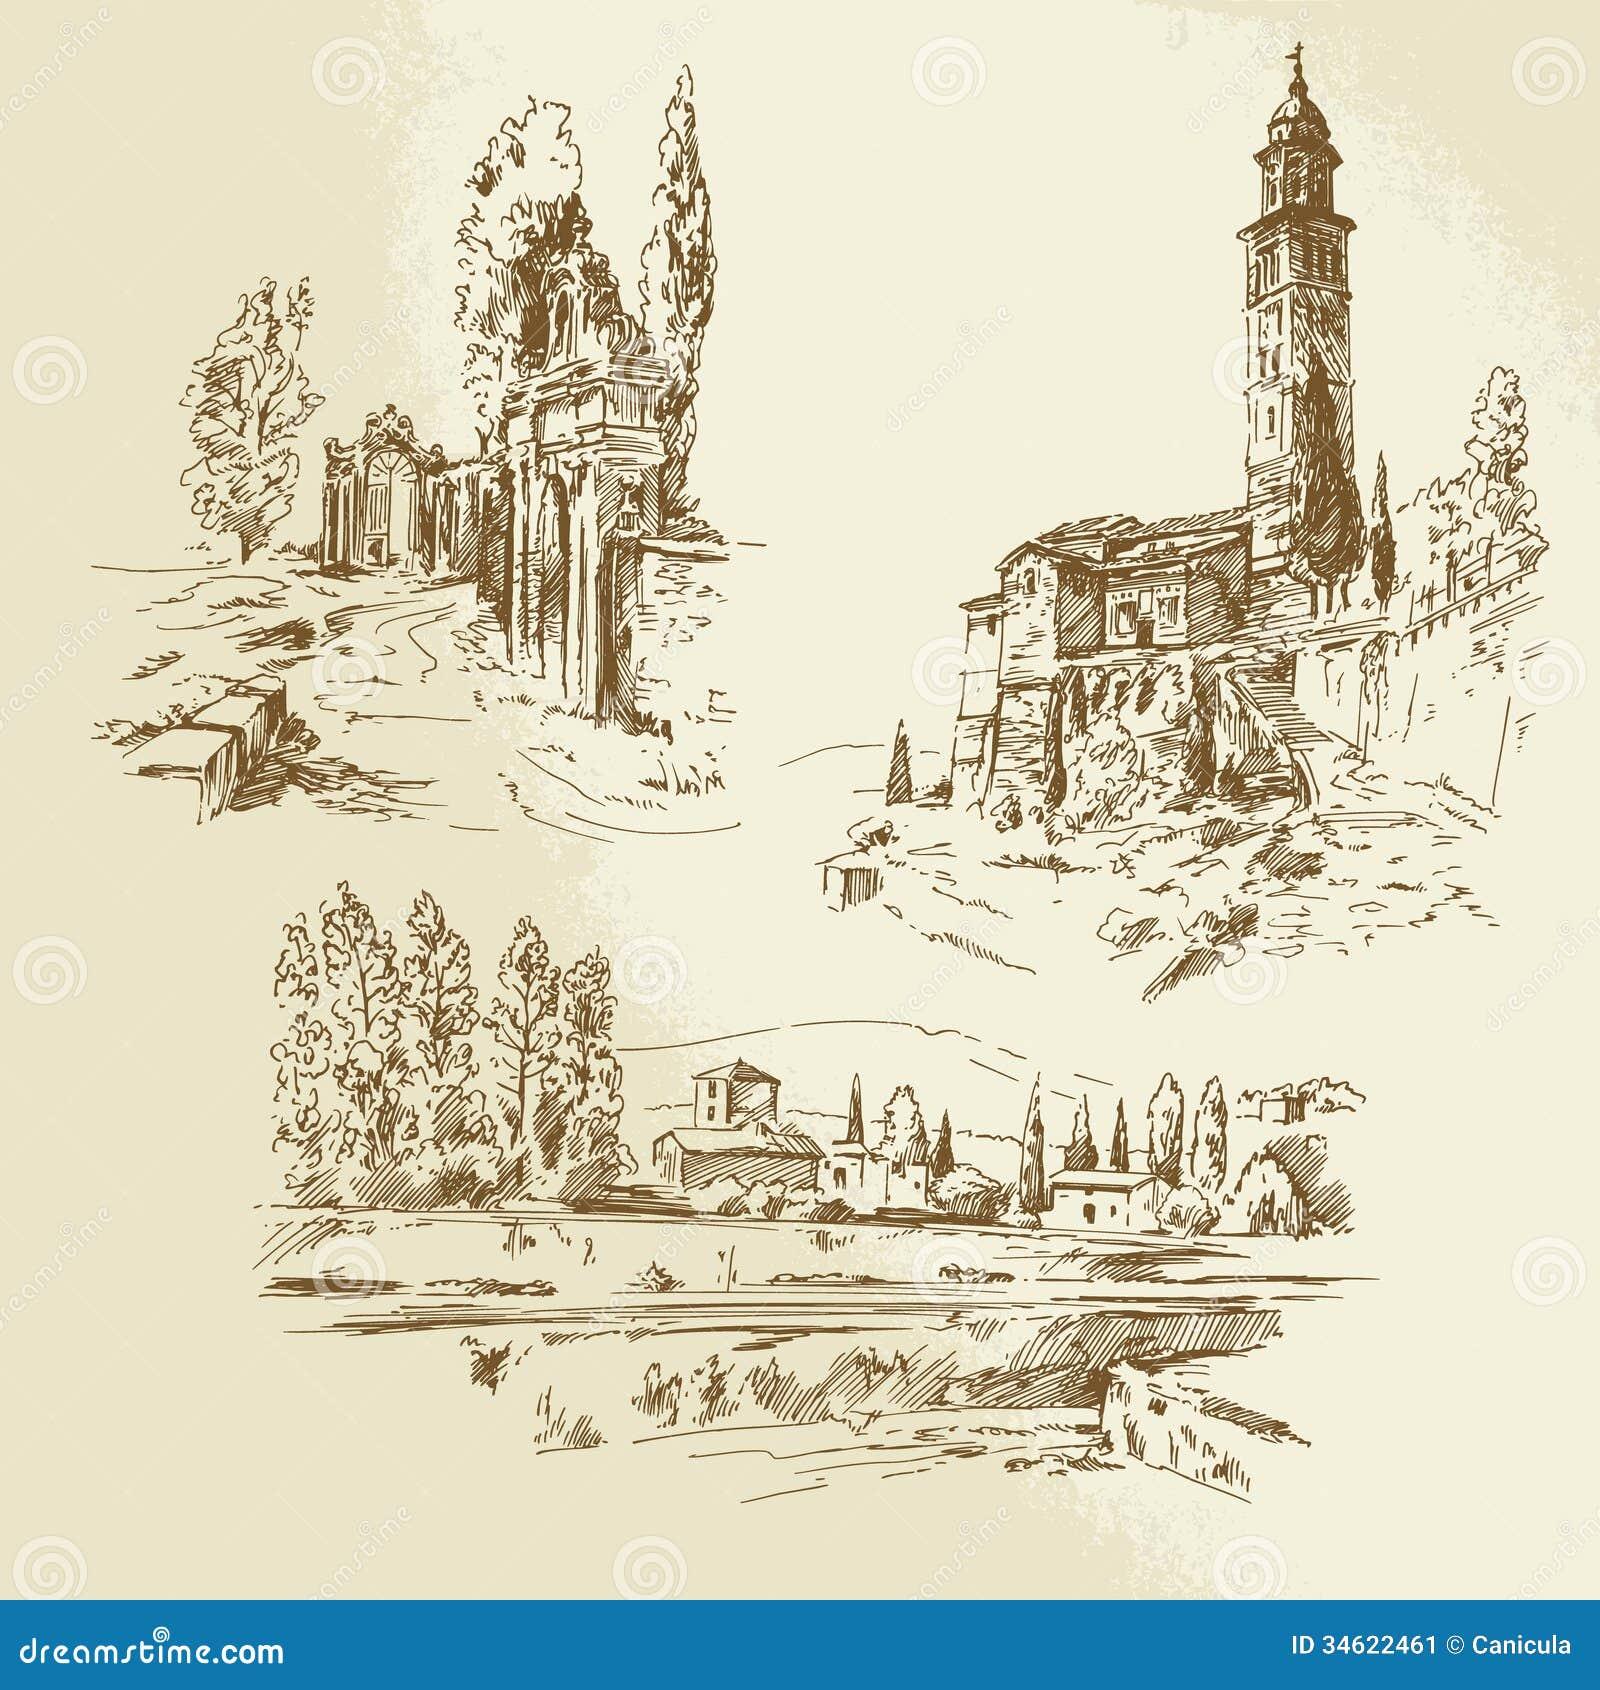 Landscape Illustration Vector Free: Italian Rural Landscape Stock Image